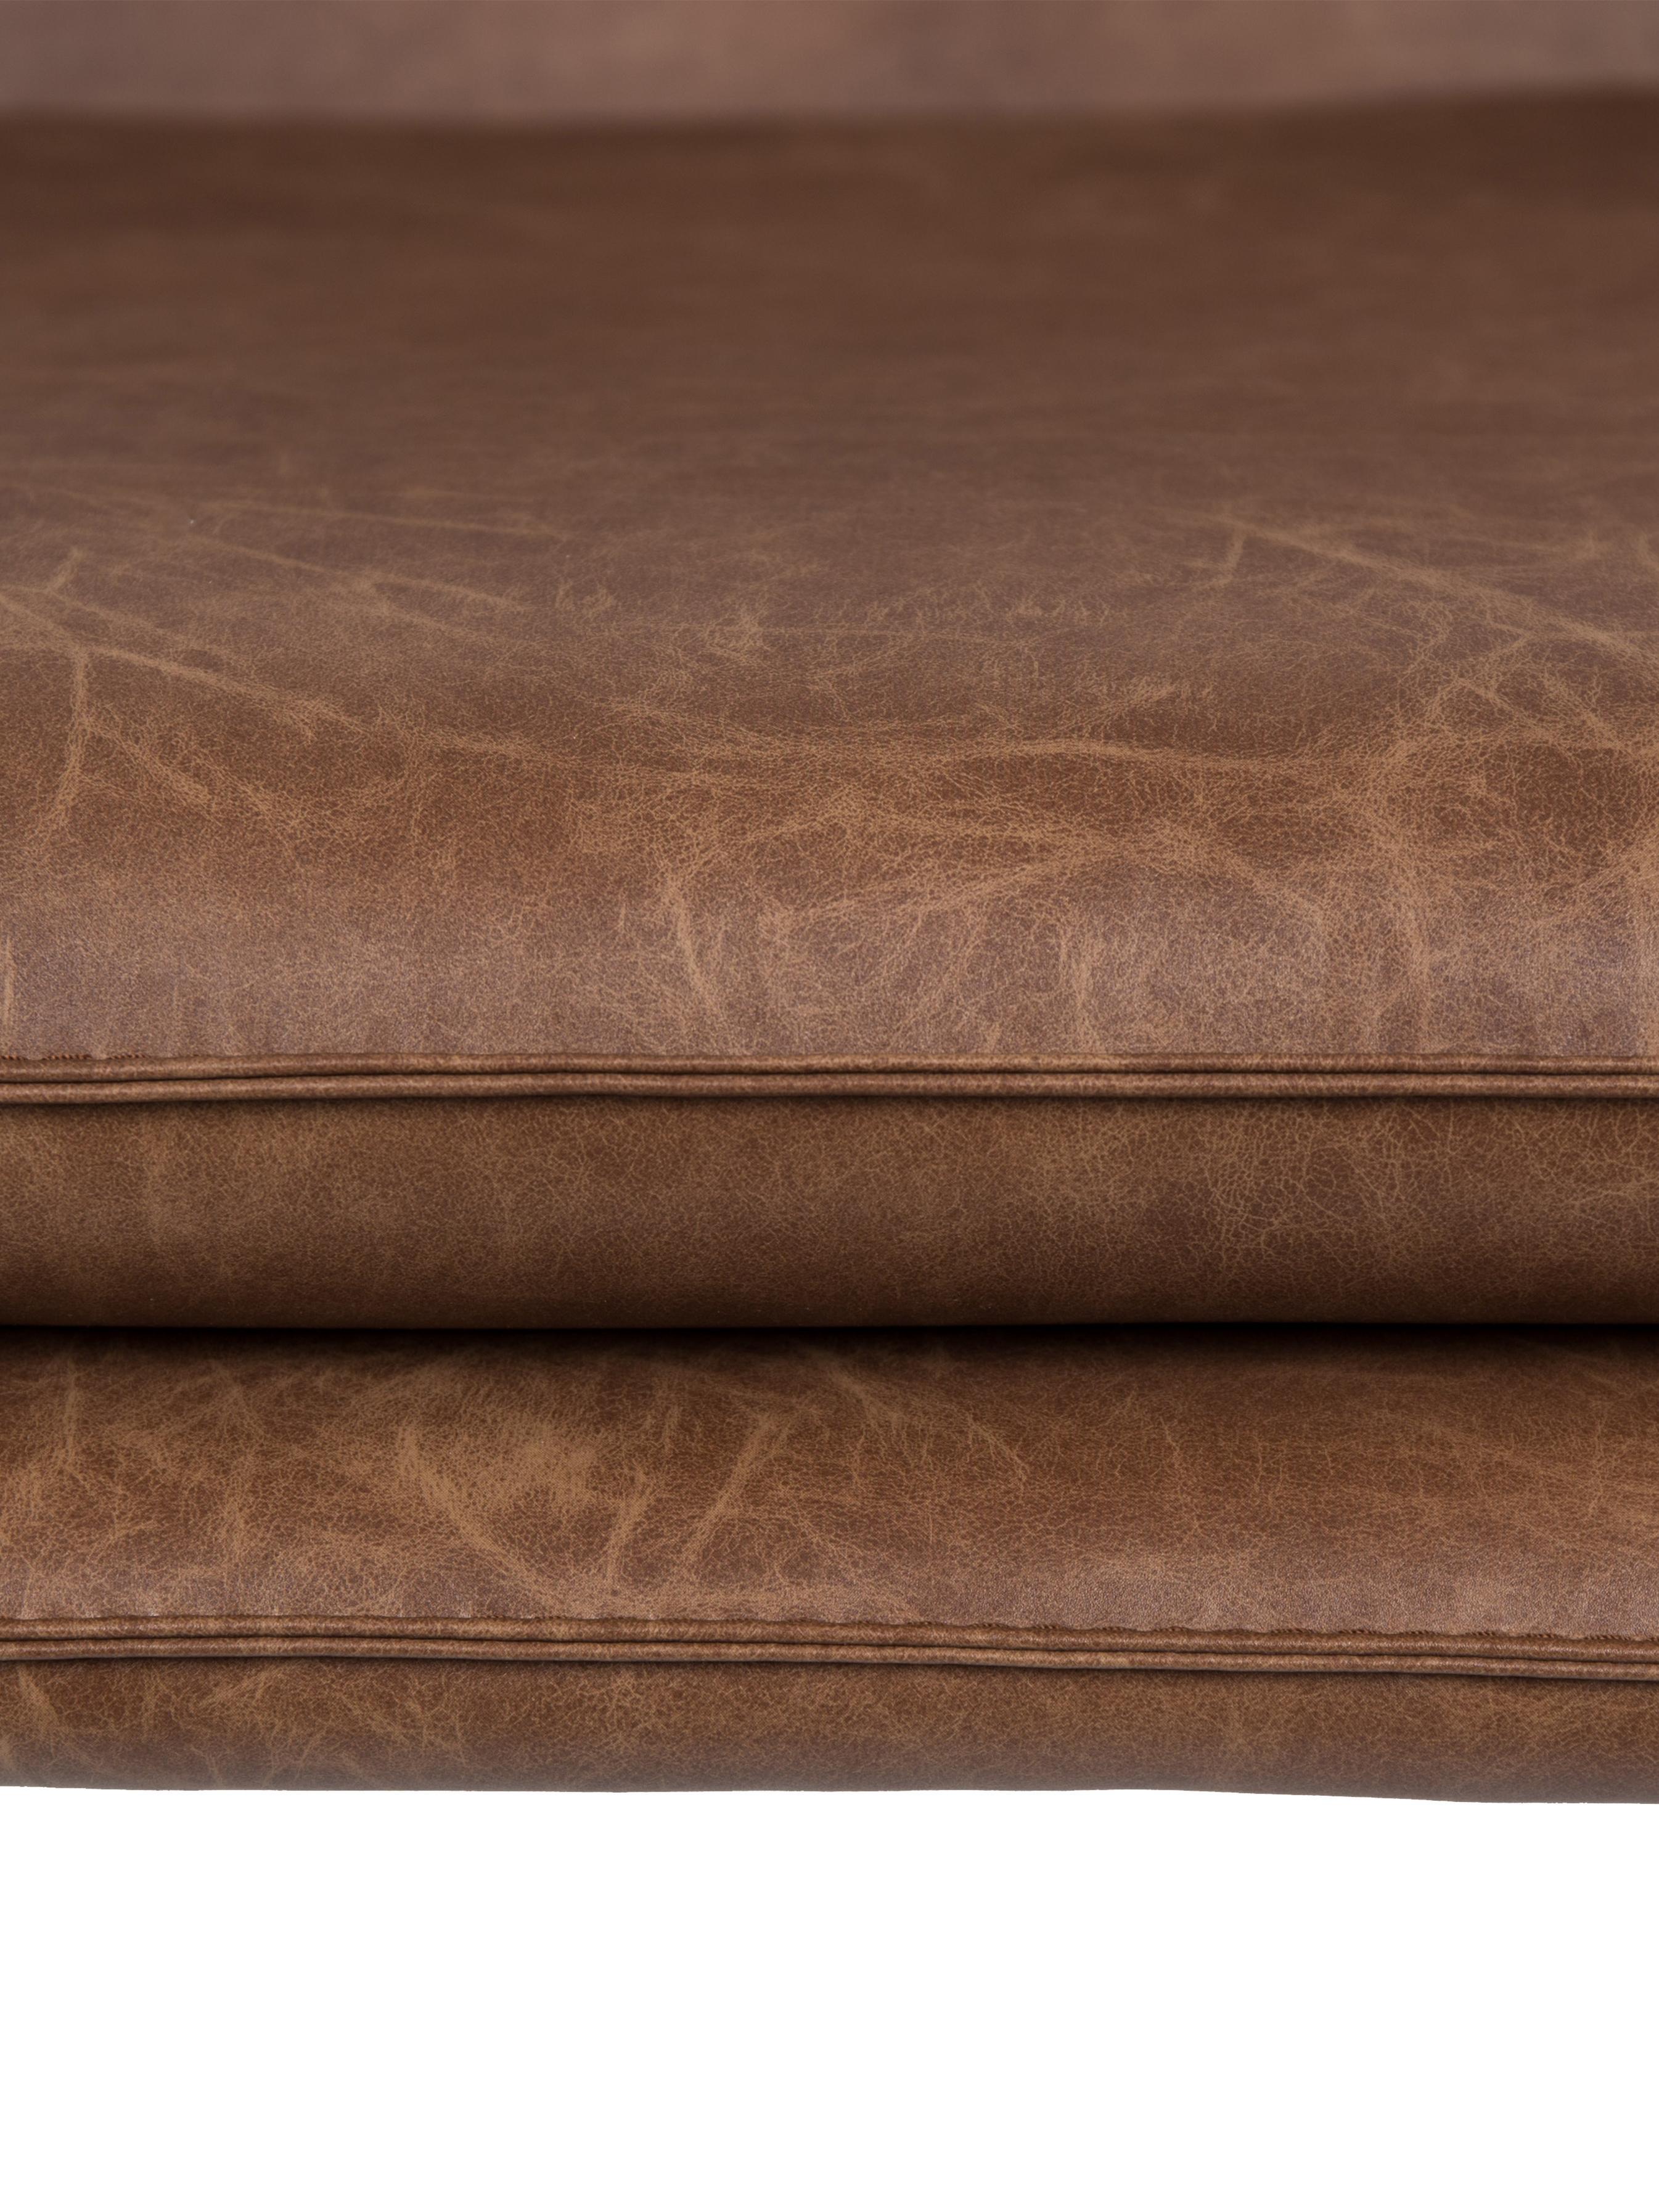 Kunstleder-Sessel Bon im Industrial Design, Bezug: Kunstleder (64% Polyureth, Füße: Metall, lackiert, Bezug: Braun, strukturiert<br>Füße: Schwarz, 80 x 78 cm